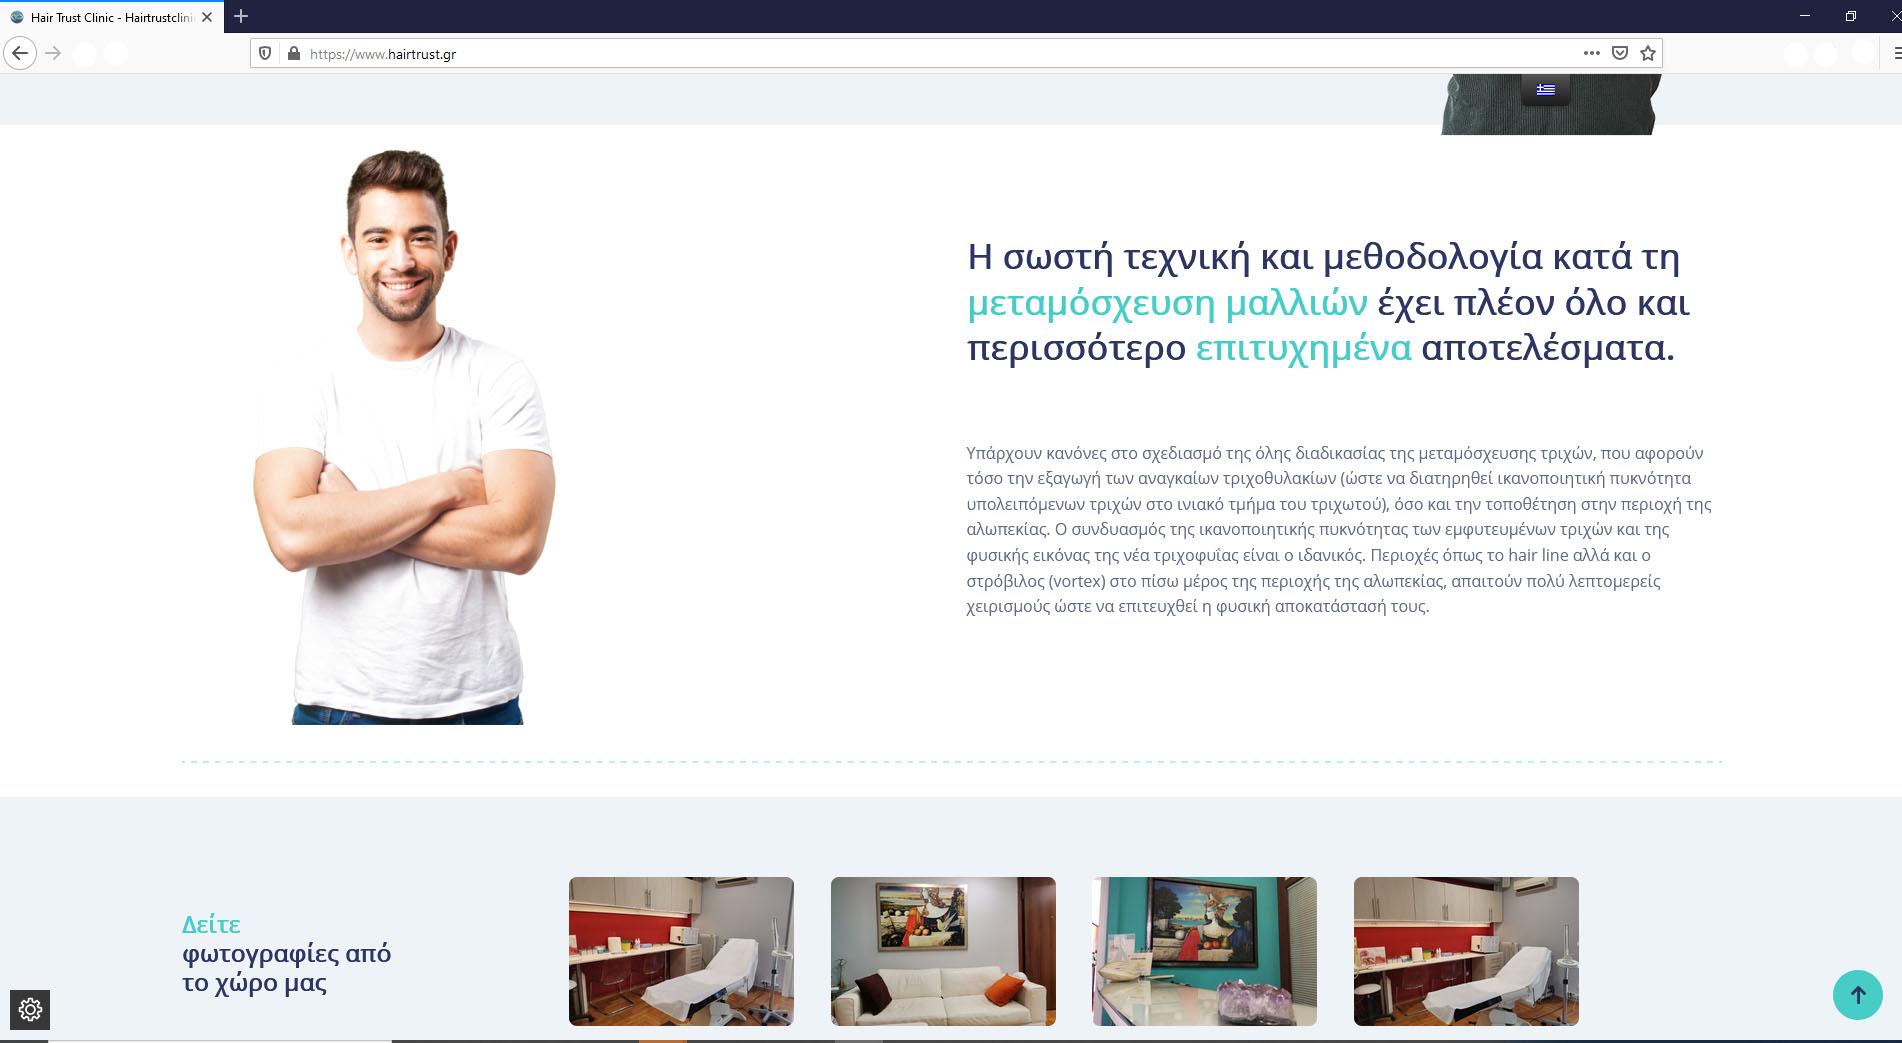 kataskevi istoselidas yourwebsite